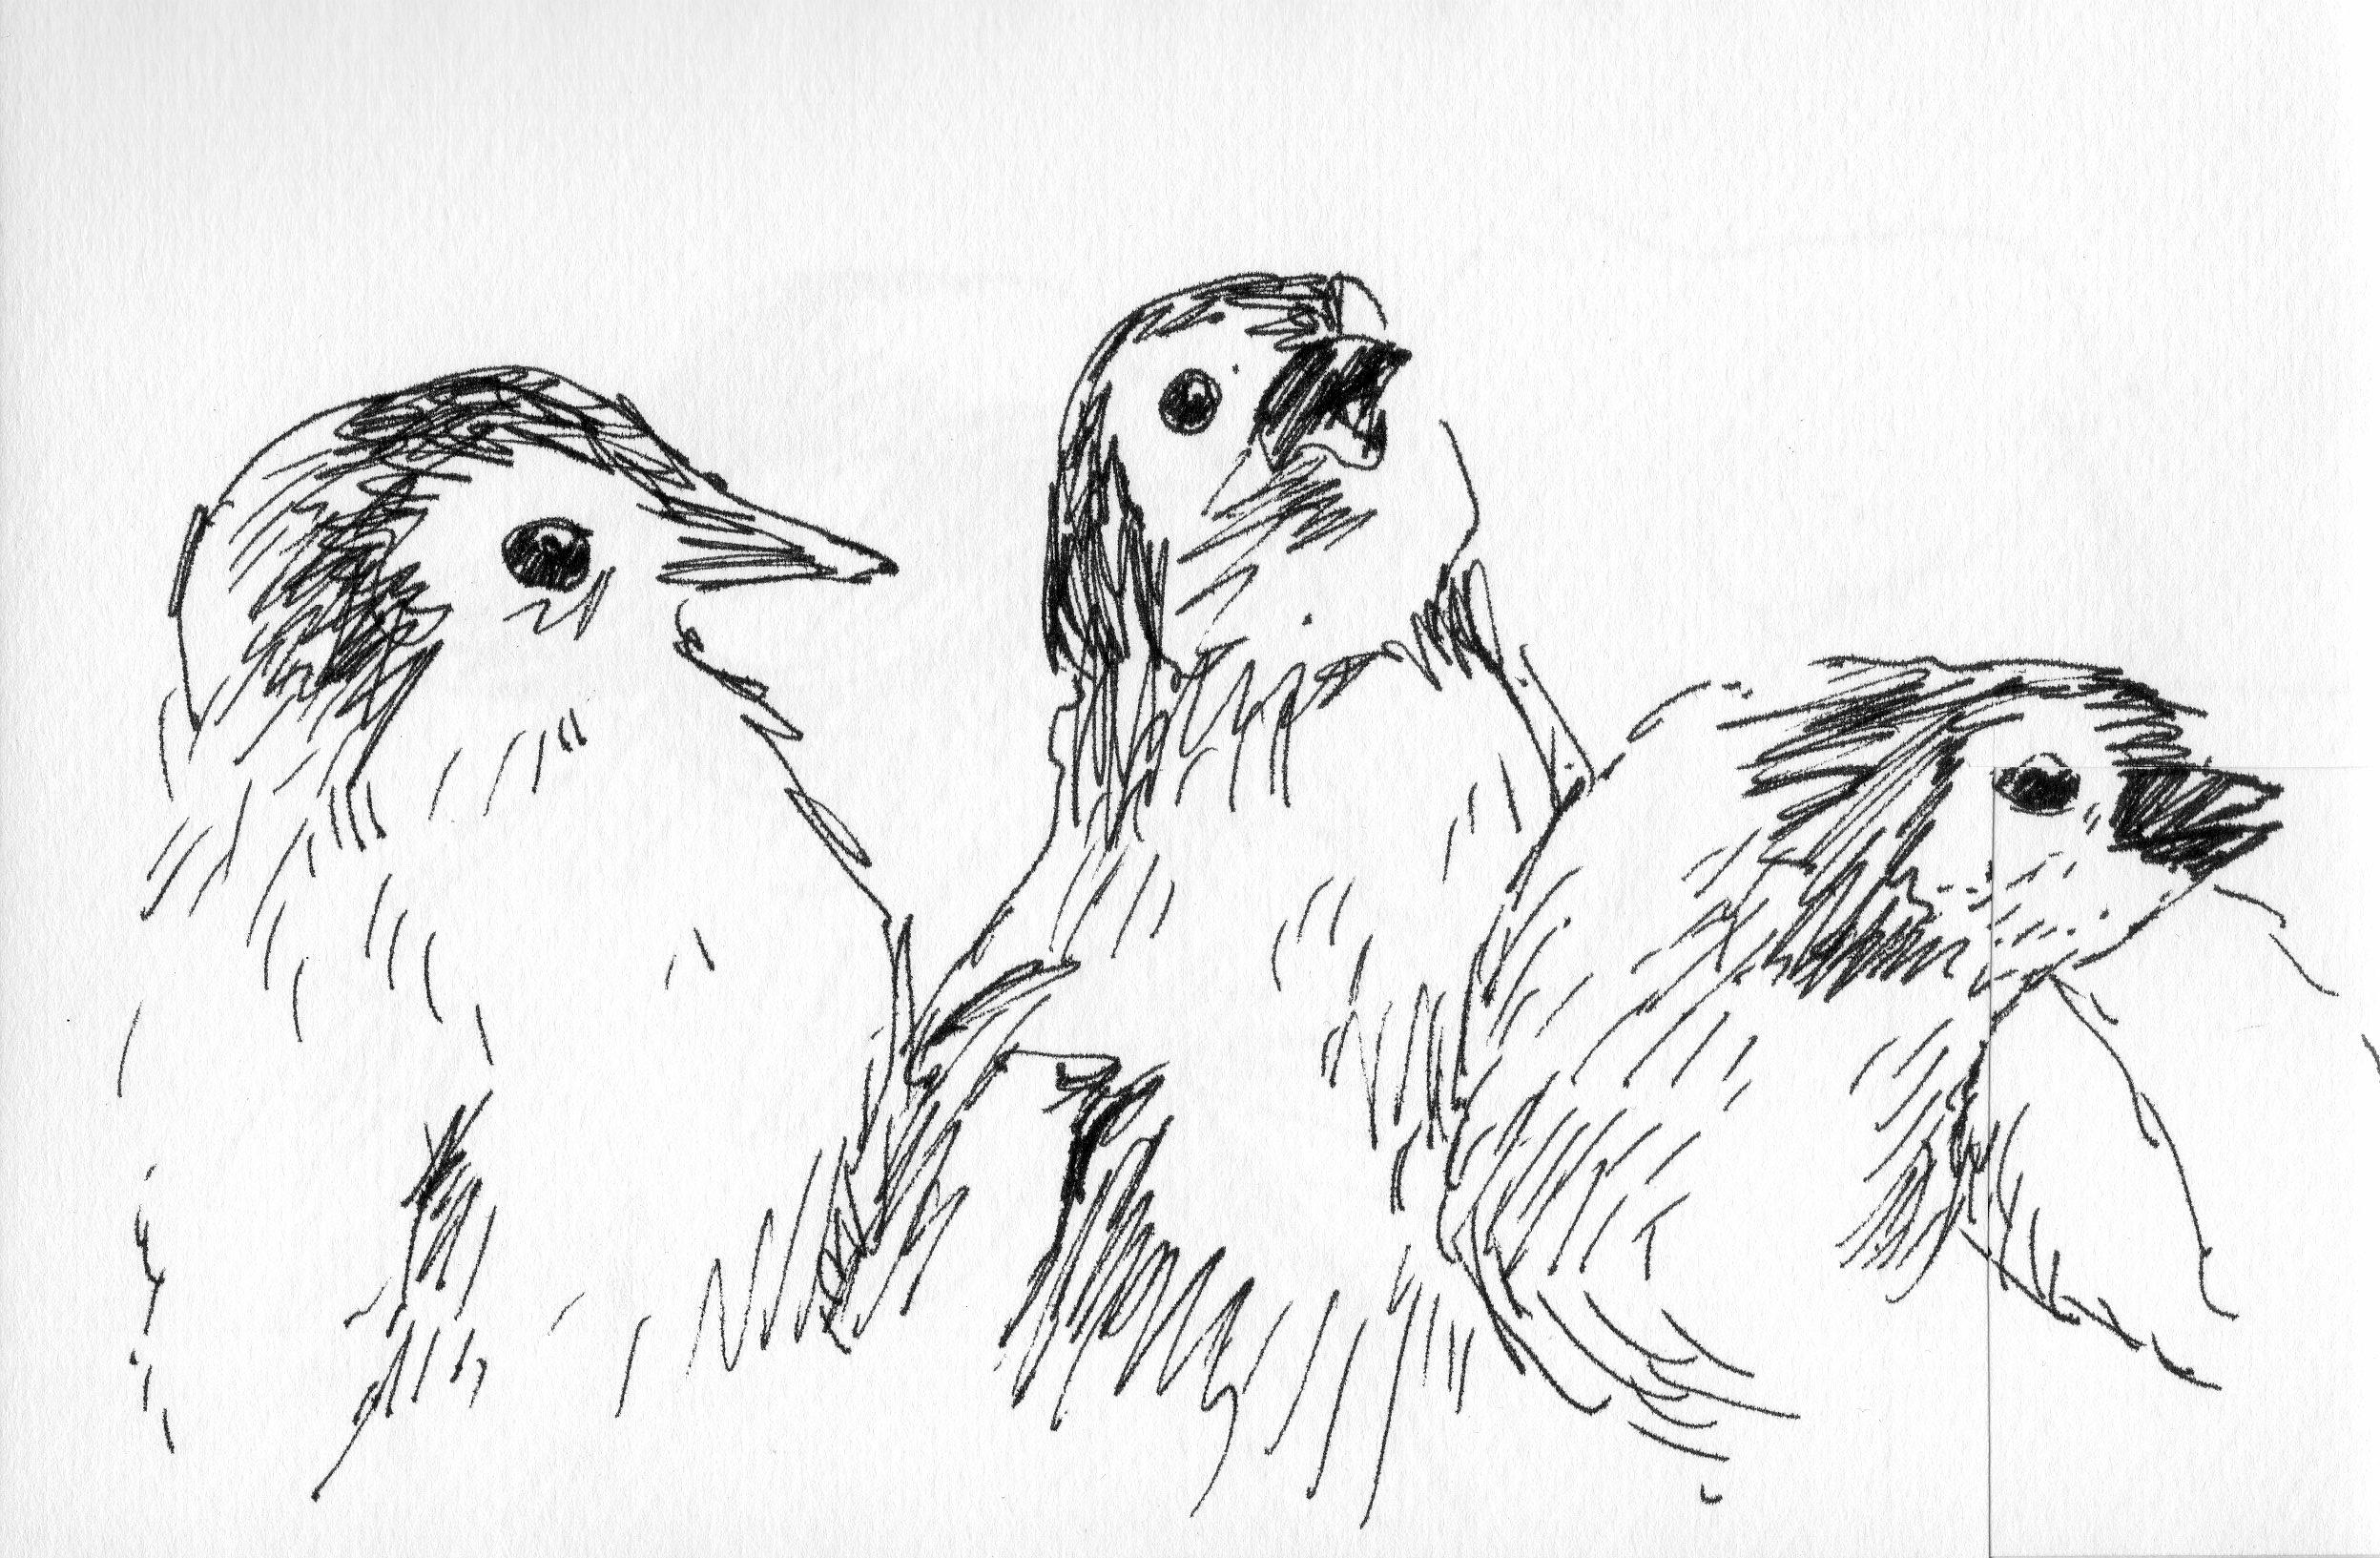 penguins_josephwallace.jpg